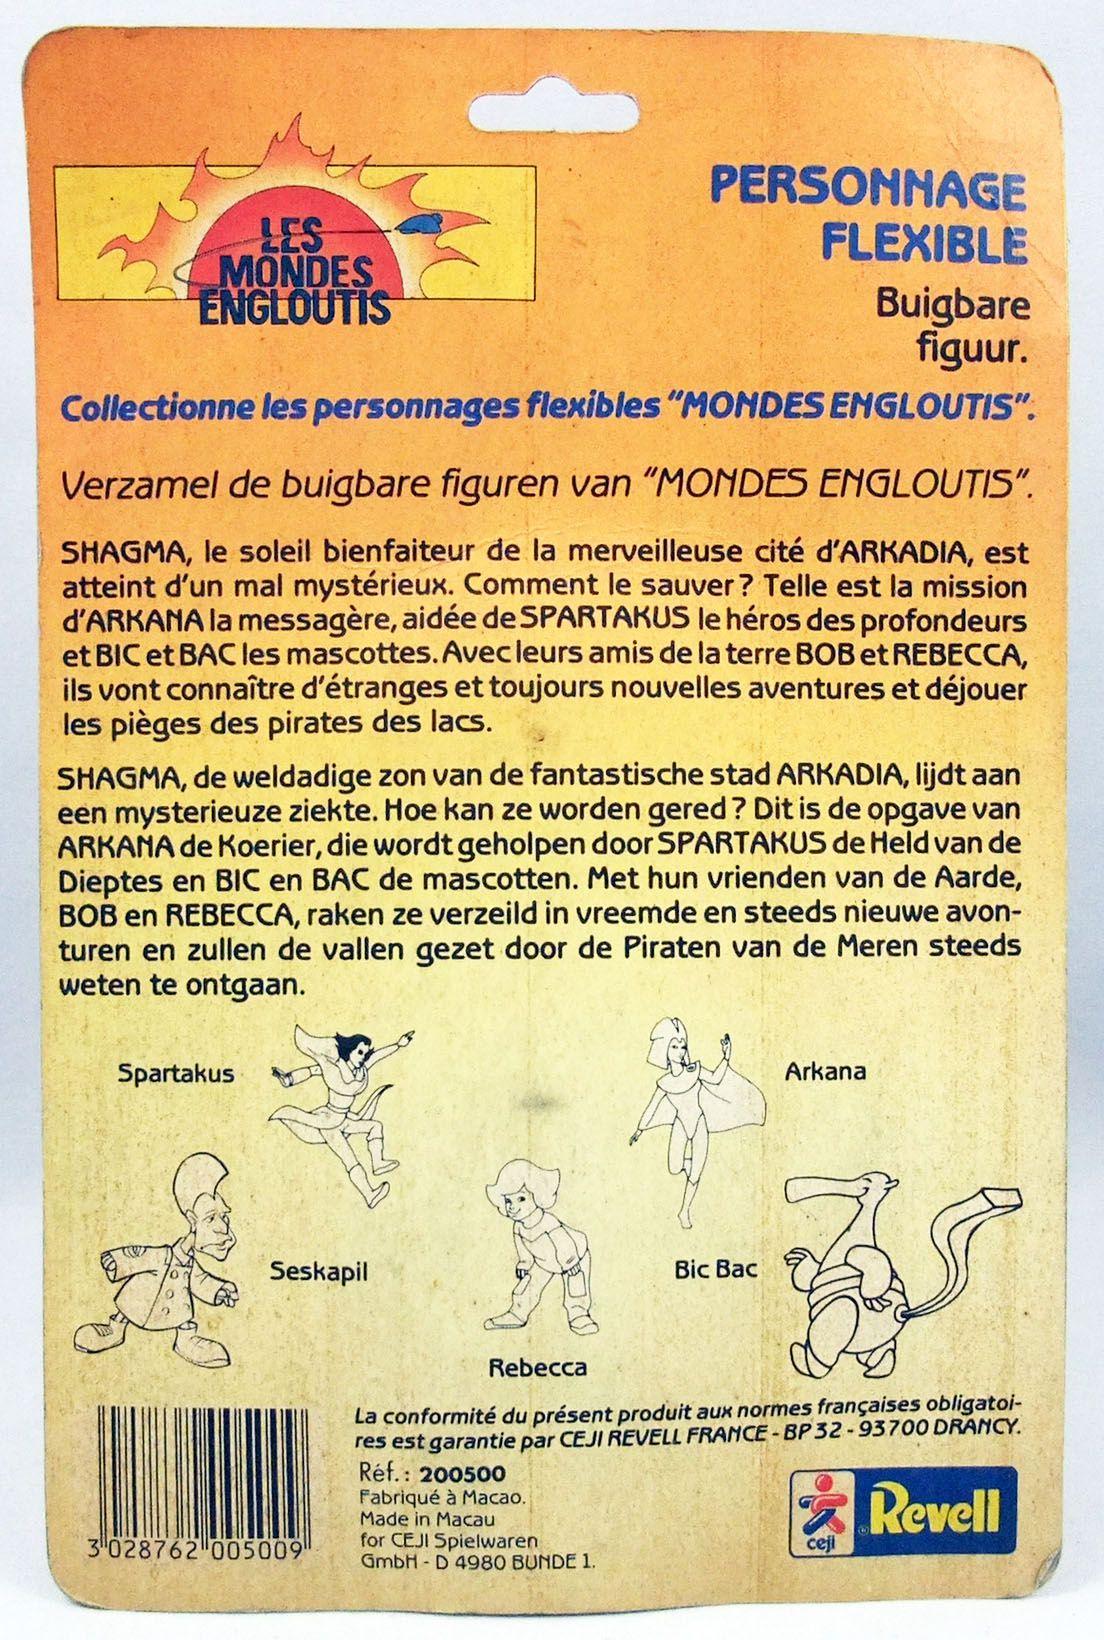 Les Mondes Engloutis - Figurine flexible - Rebecca